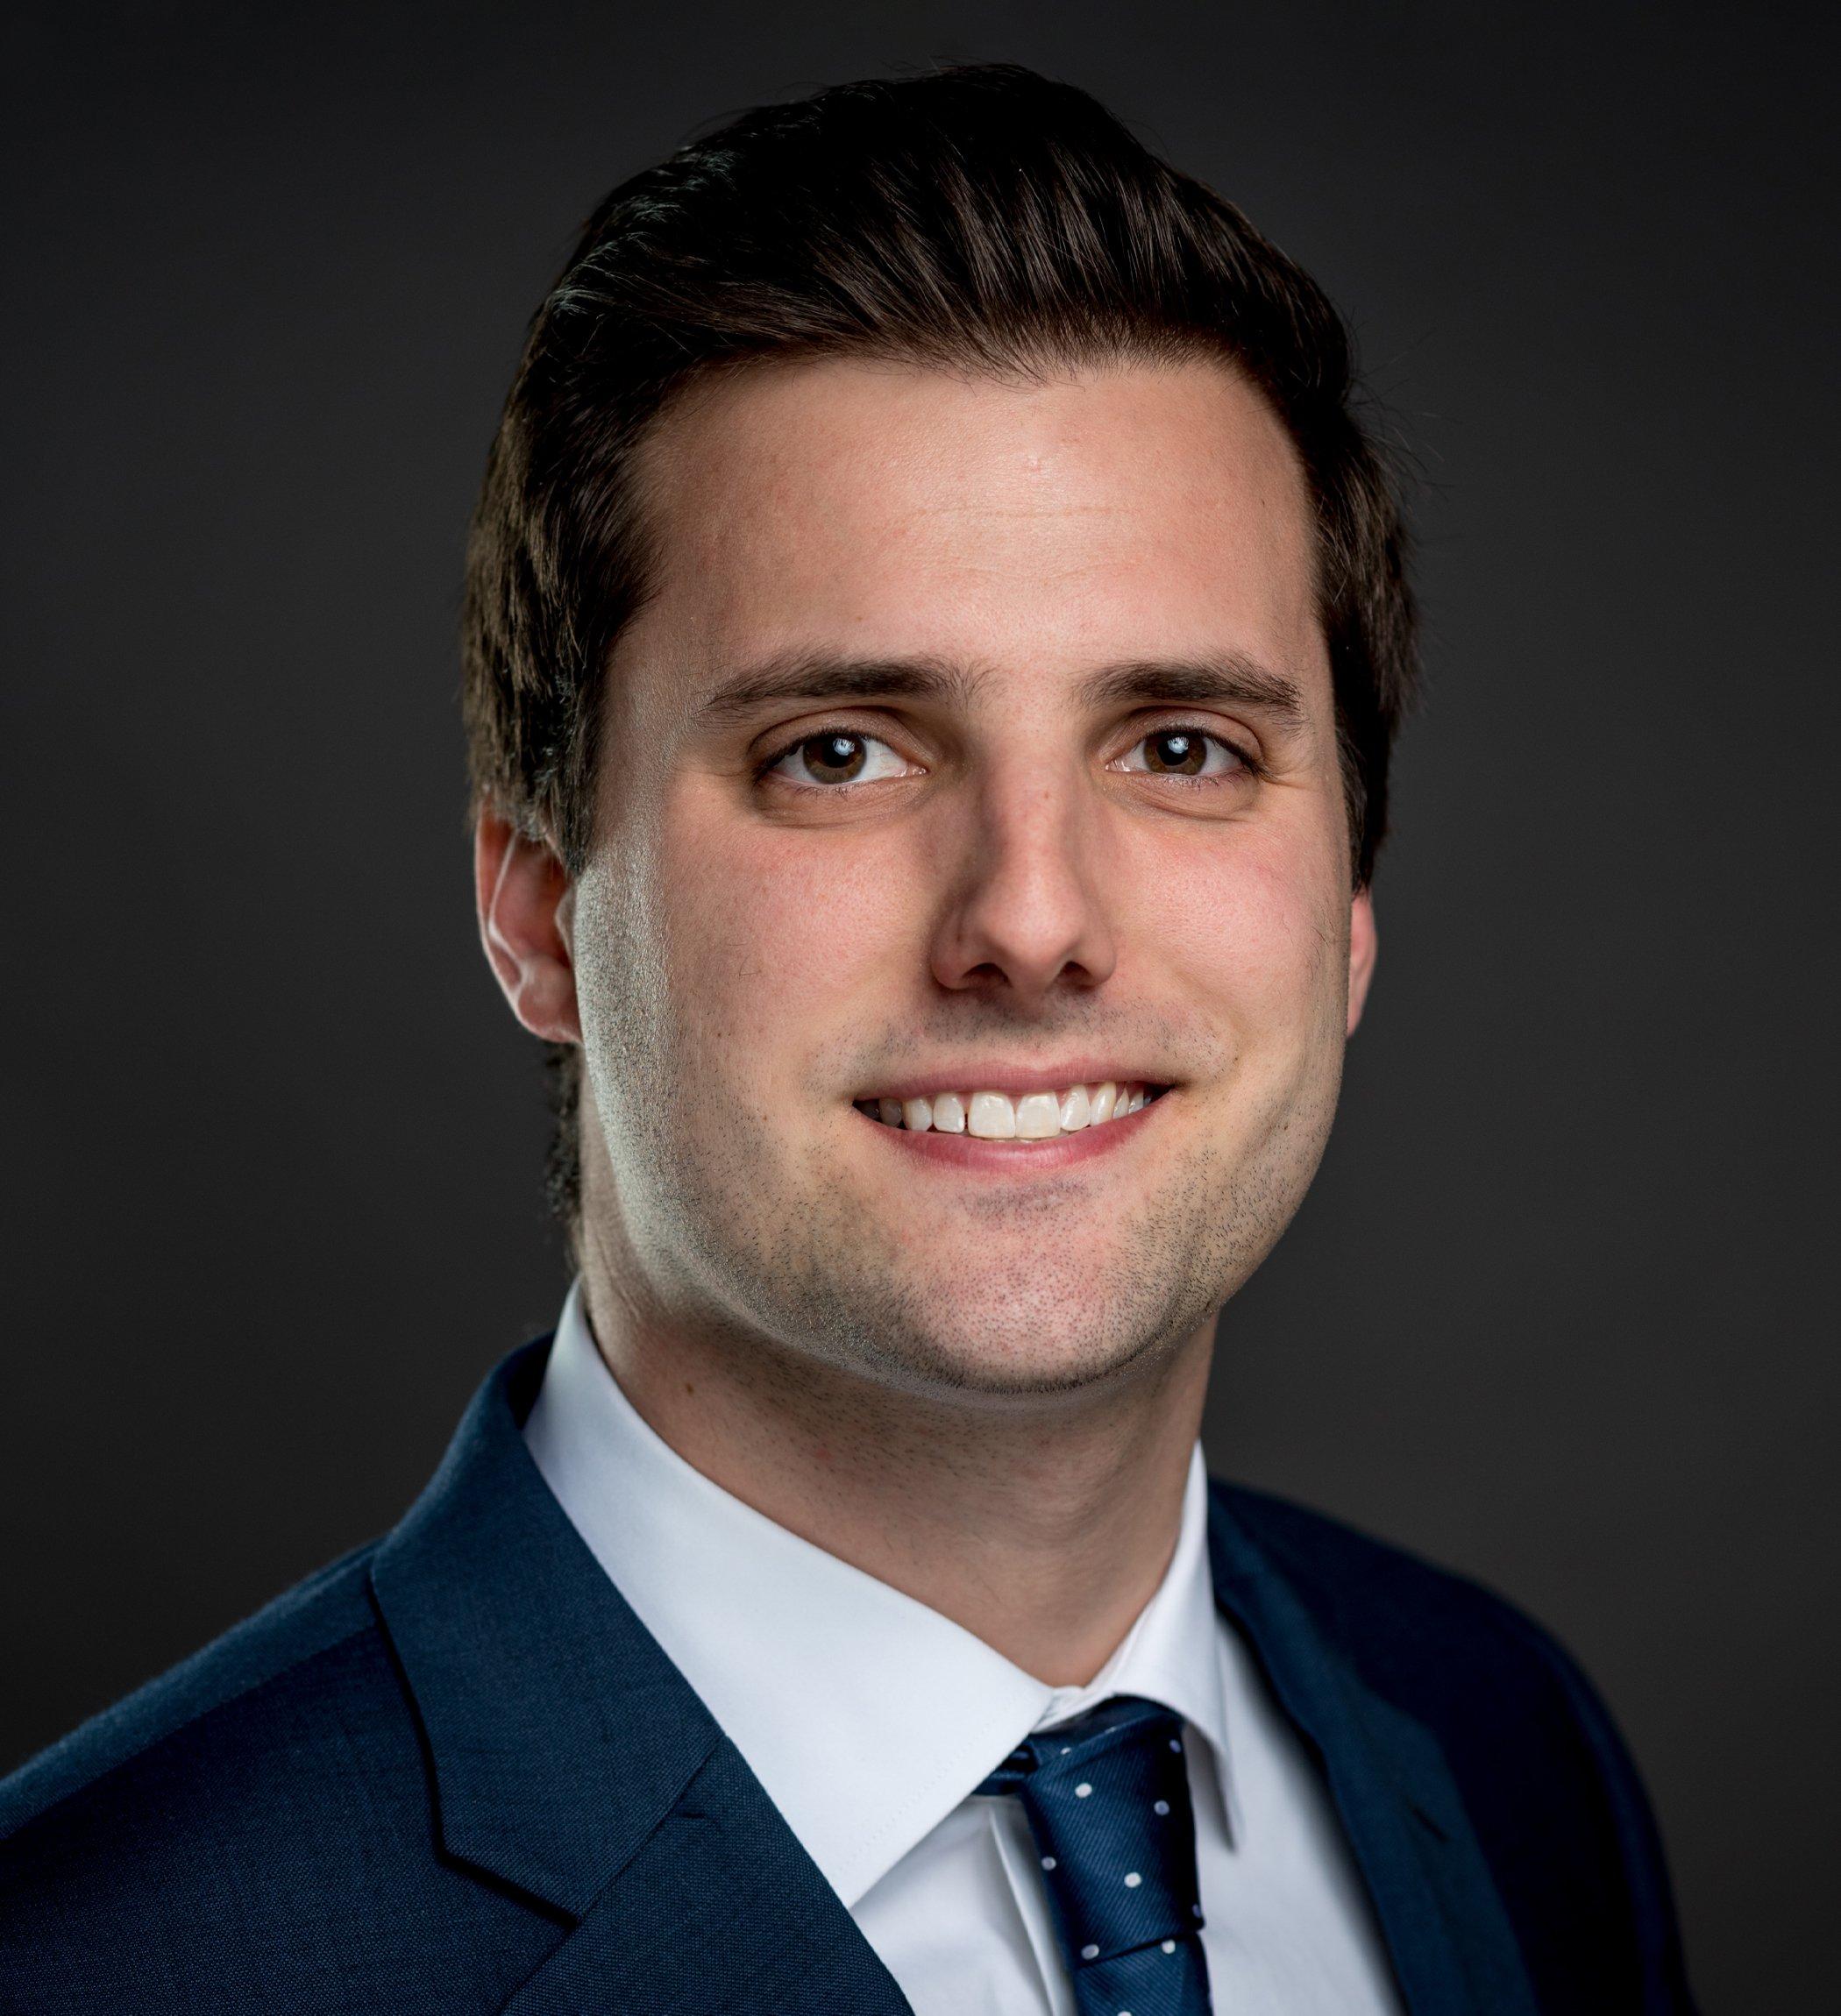 Nick Butz Headshot | Dakota Investments